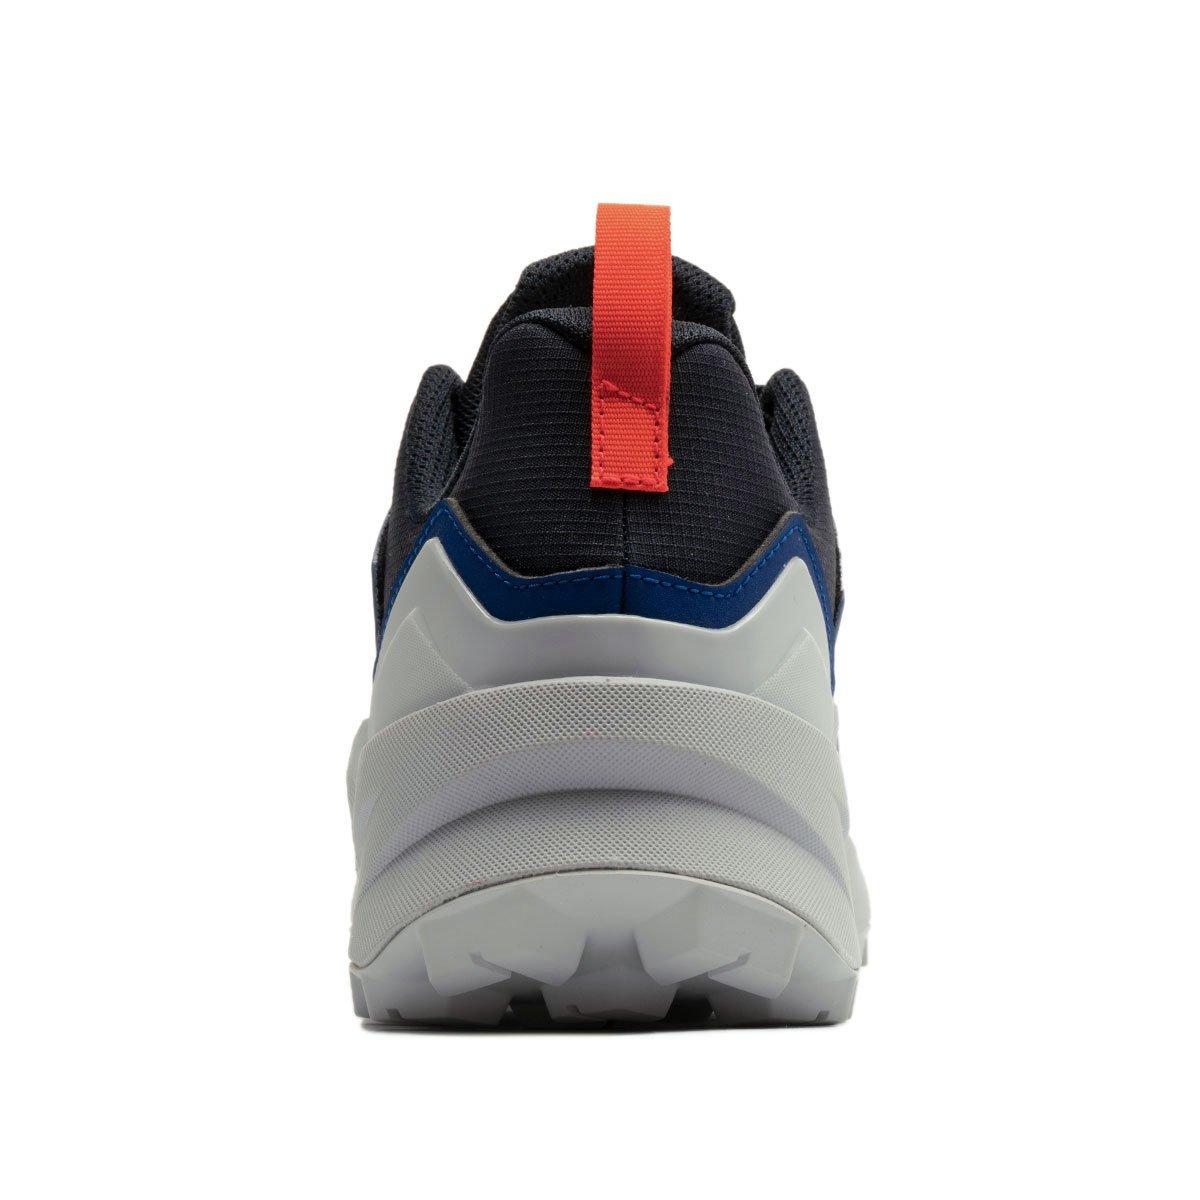 Adidas Terrex Swift R3